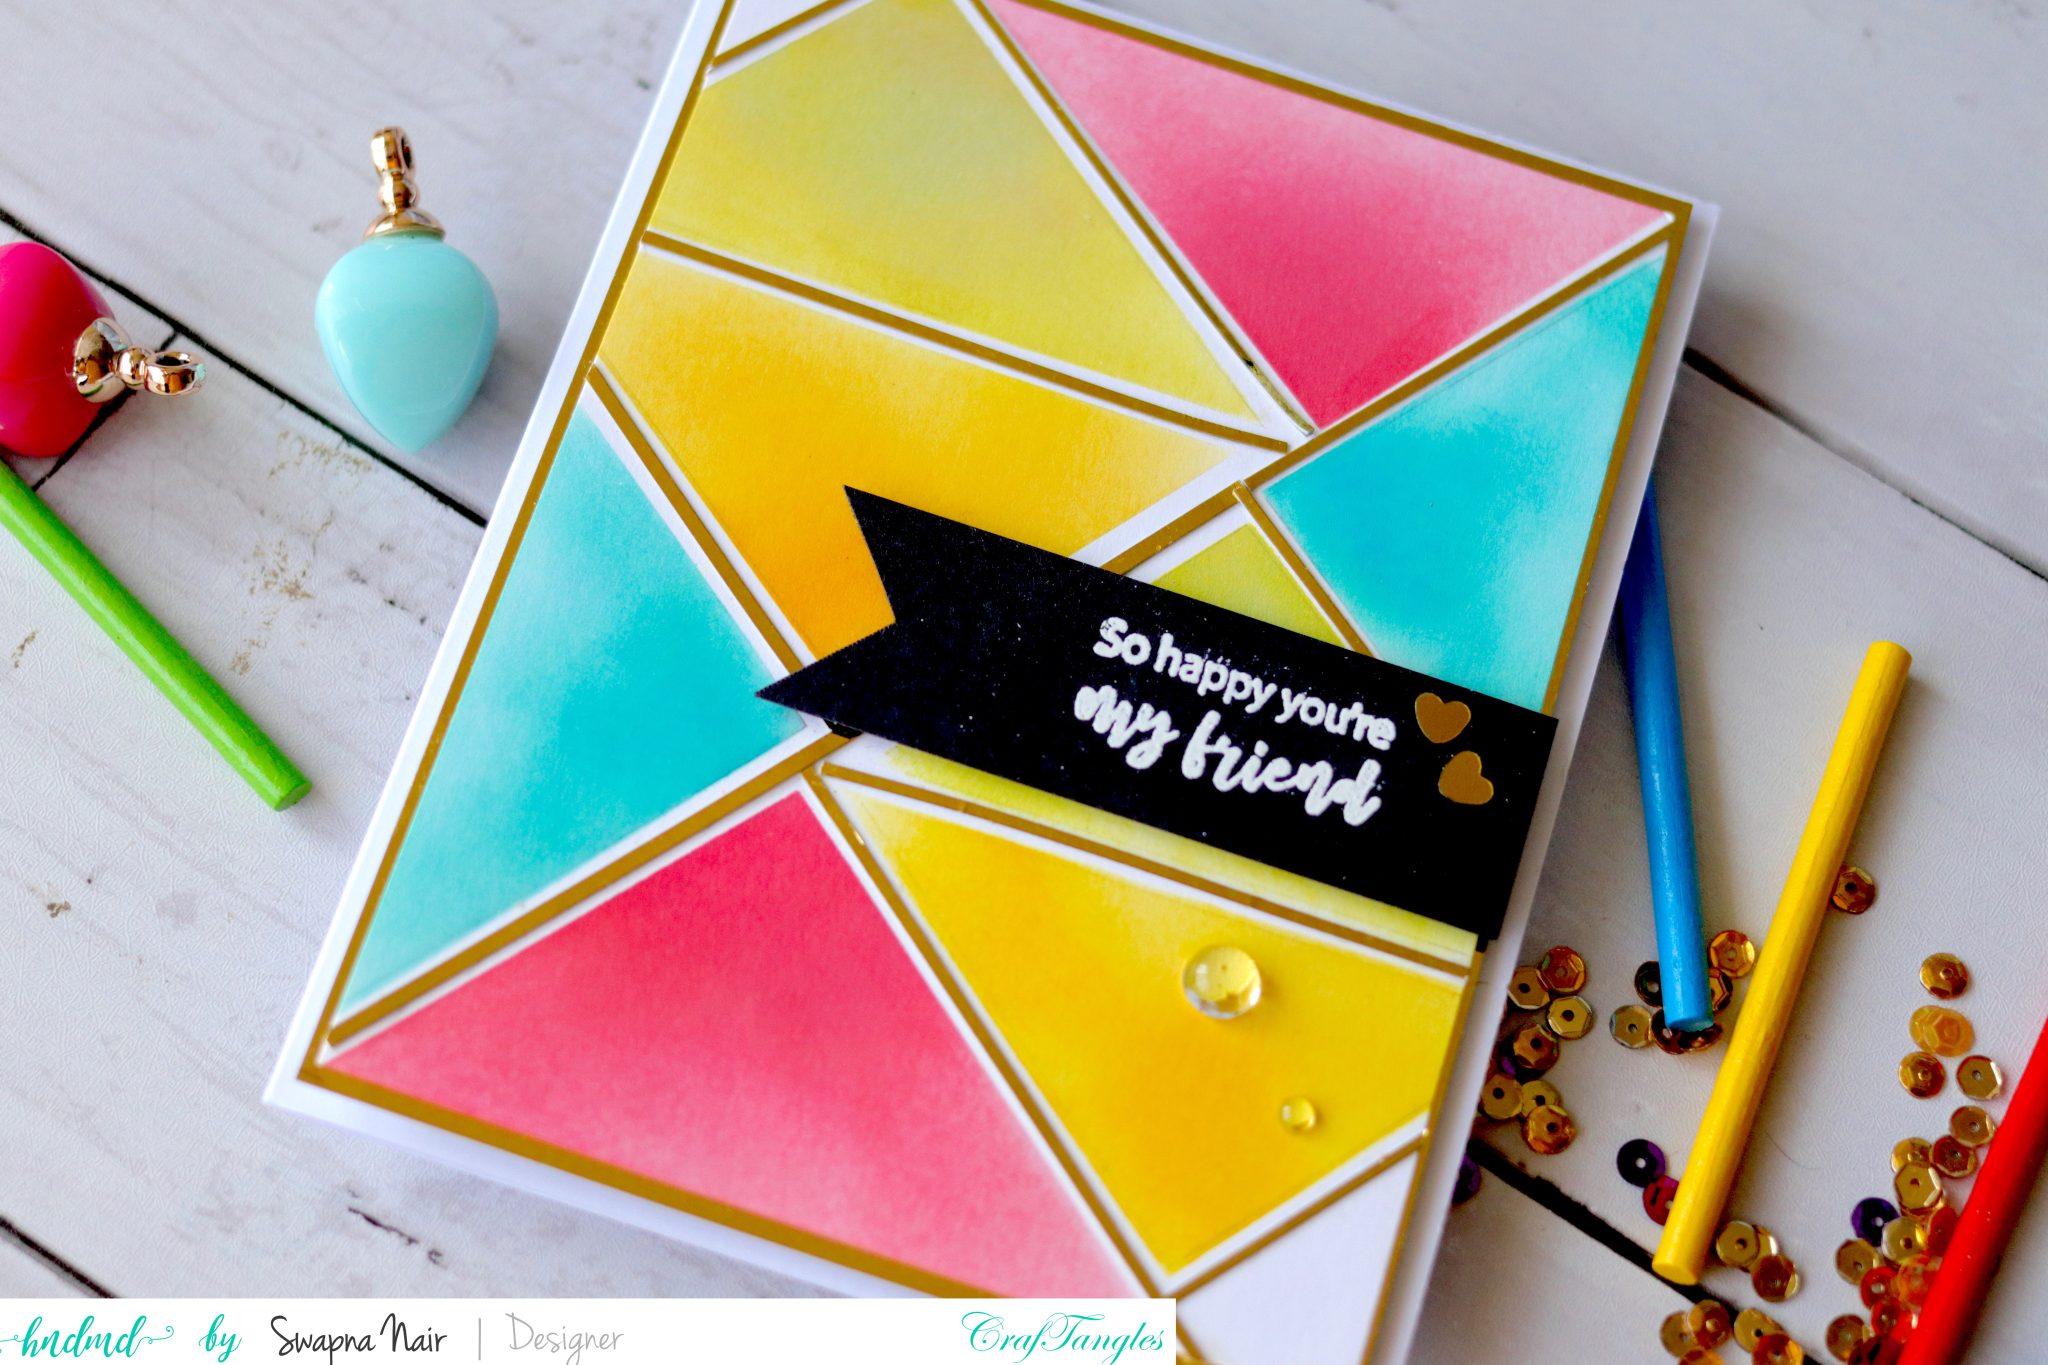 Cardmaking Ideas - 4 Easy Cards using Stencils 2